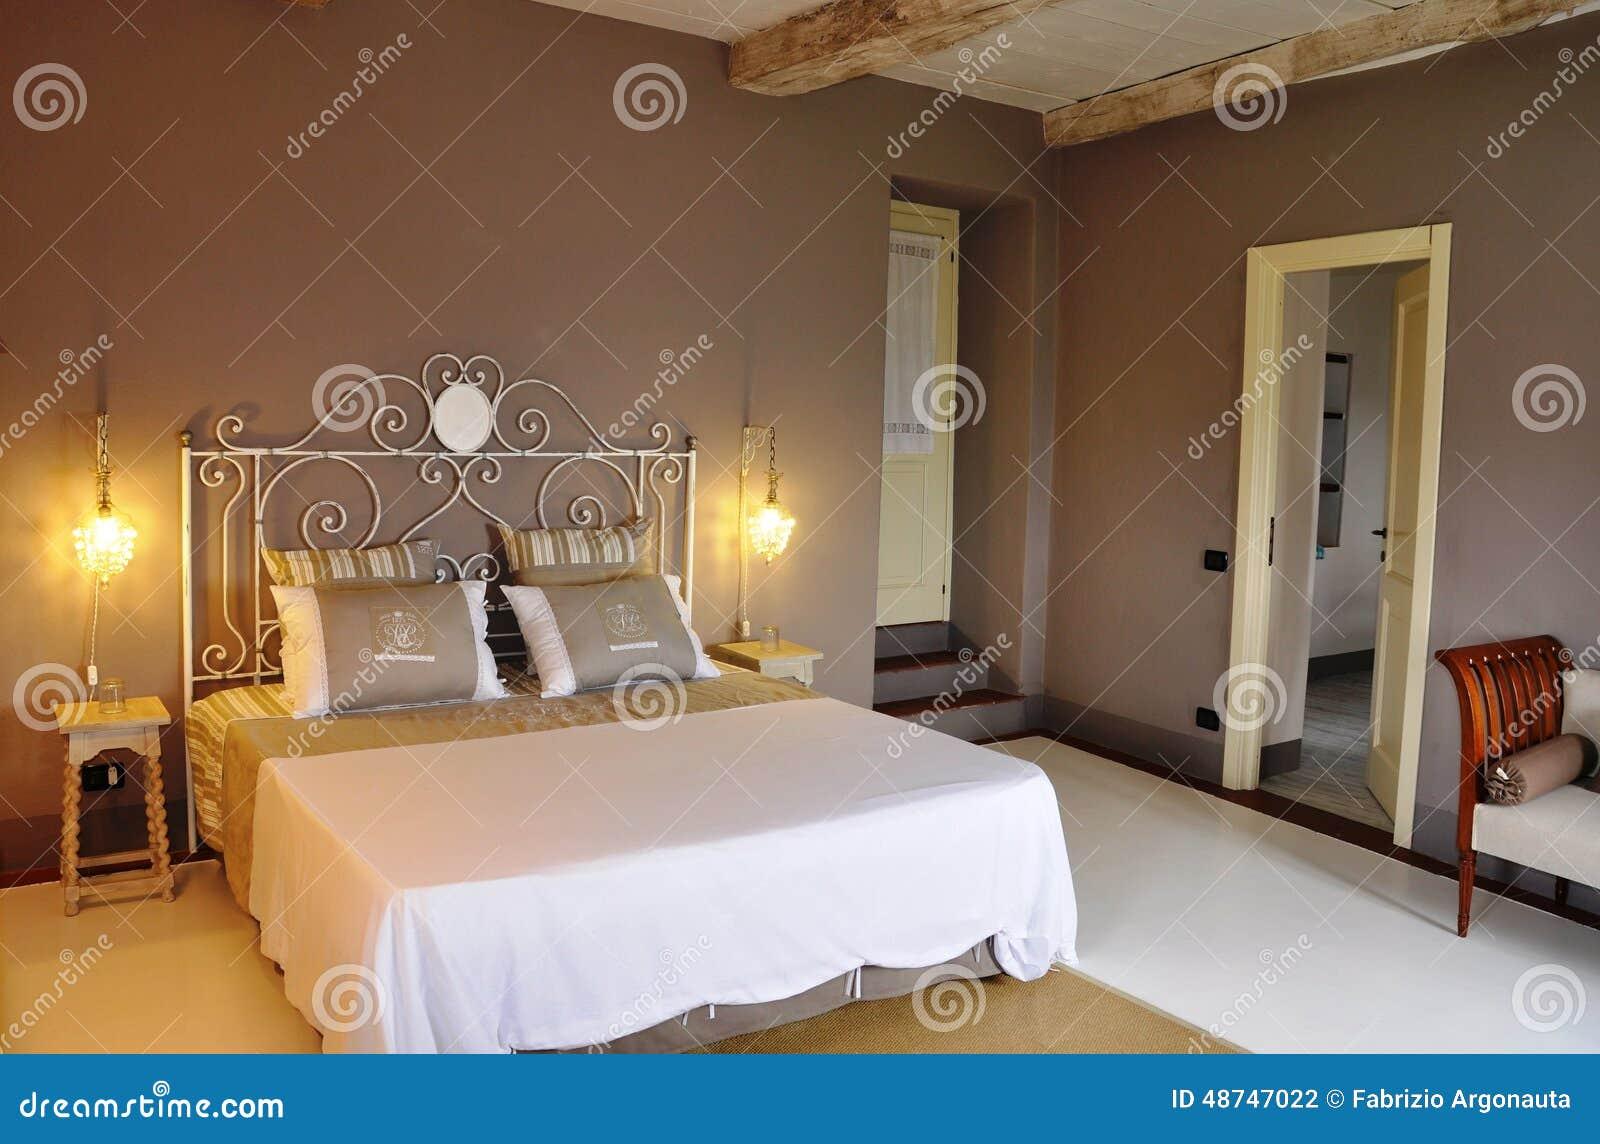 Chambre A Coucher Romantique La Chambre Coucher Stylisee Chambre A Coucher Moderne Romantique